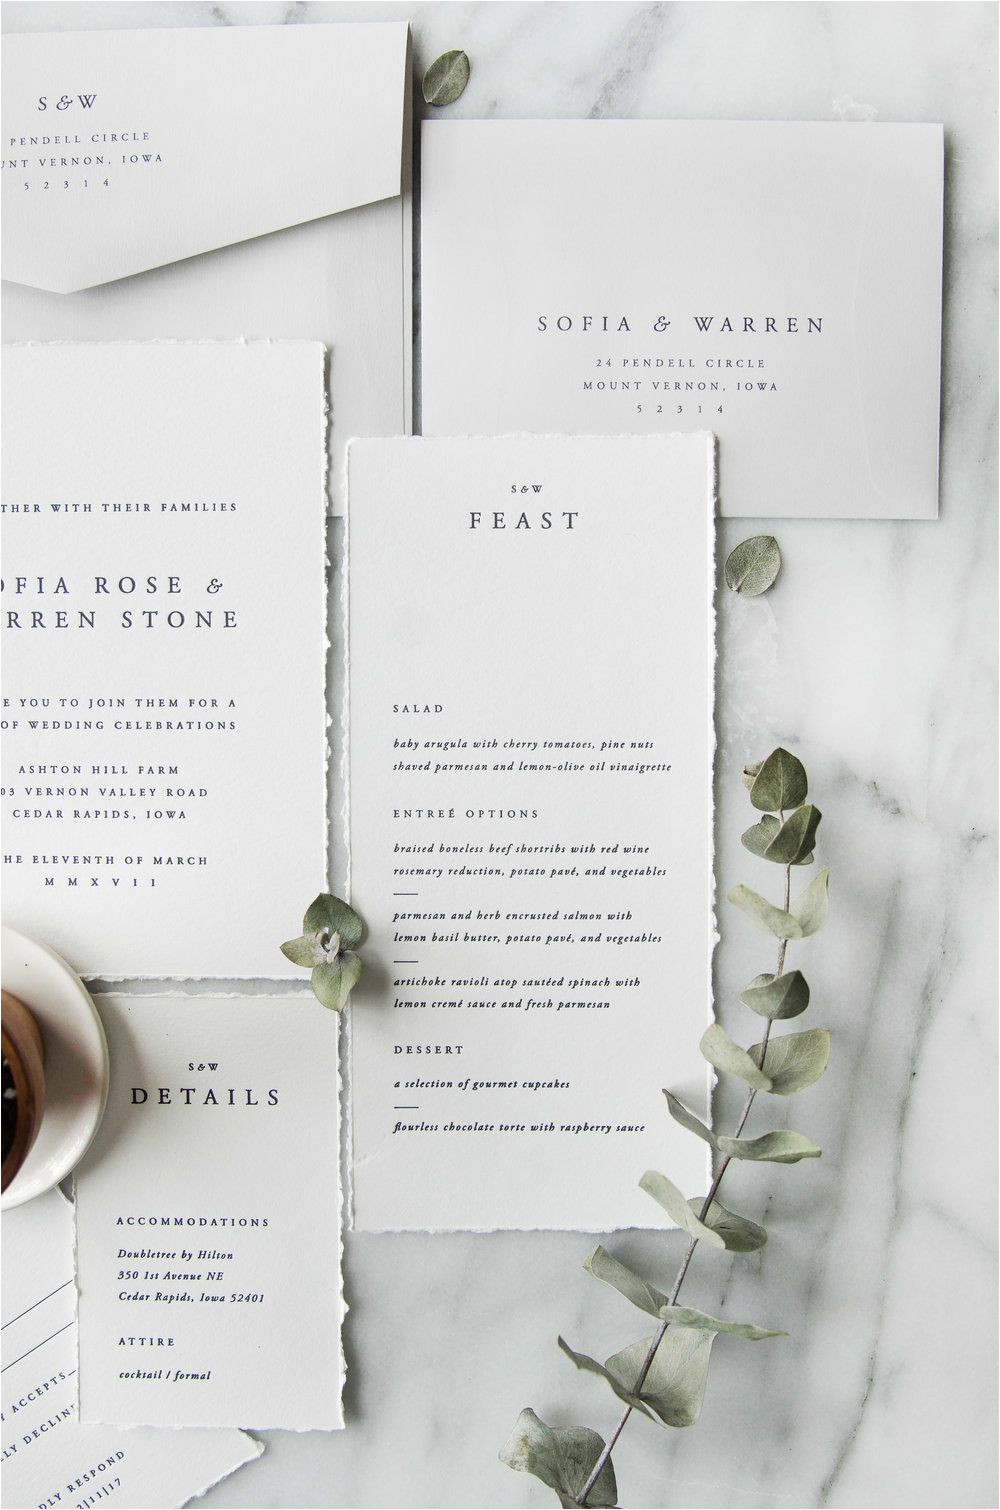 Unique Wedding Menu Card Ideas sofia Semi Custom Menu Design Simple Traditional Classic